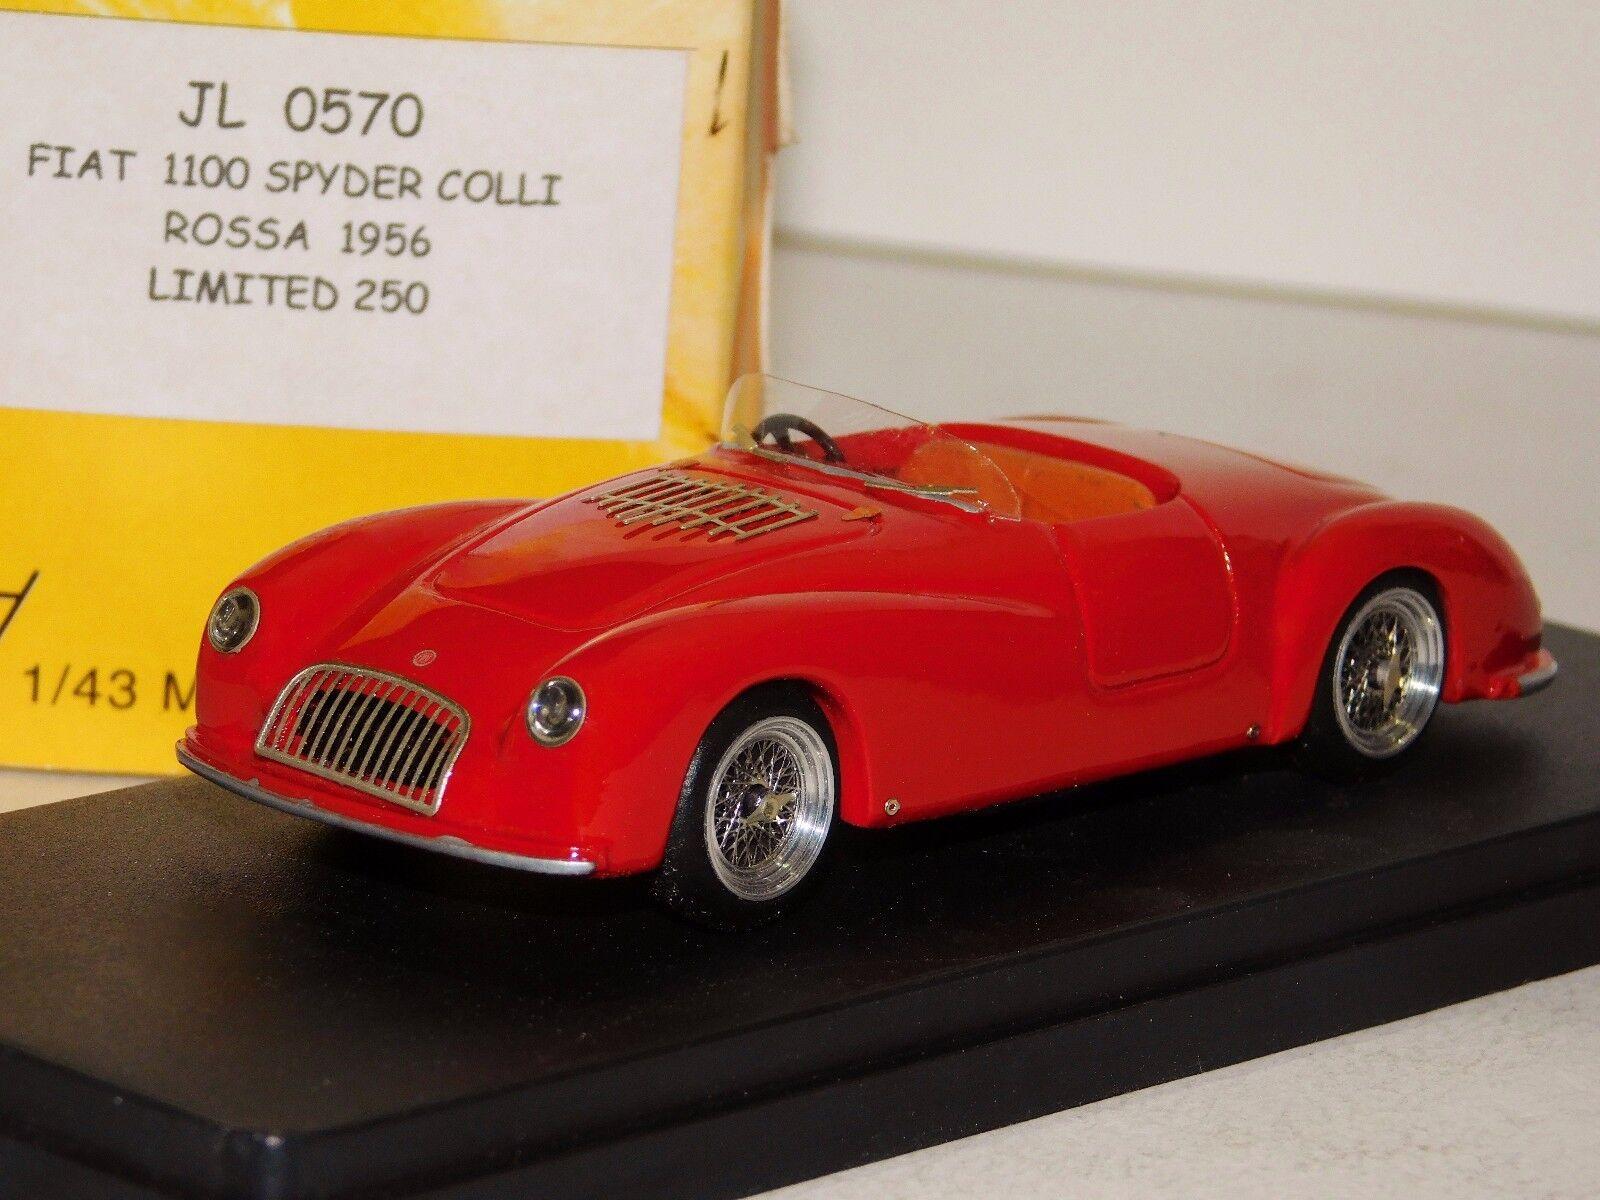 FIAT 1100 SPYDER COLLI  ROSSA 1956 LIM. JOLLY JL 0570 1 43